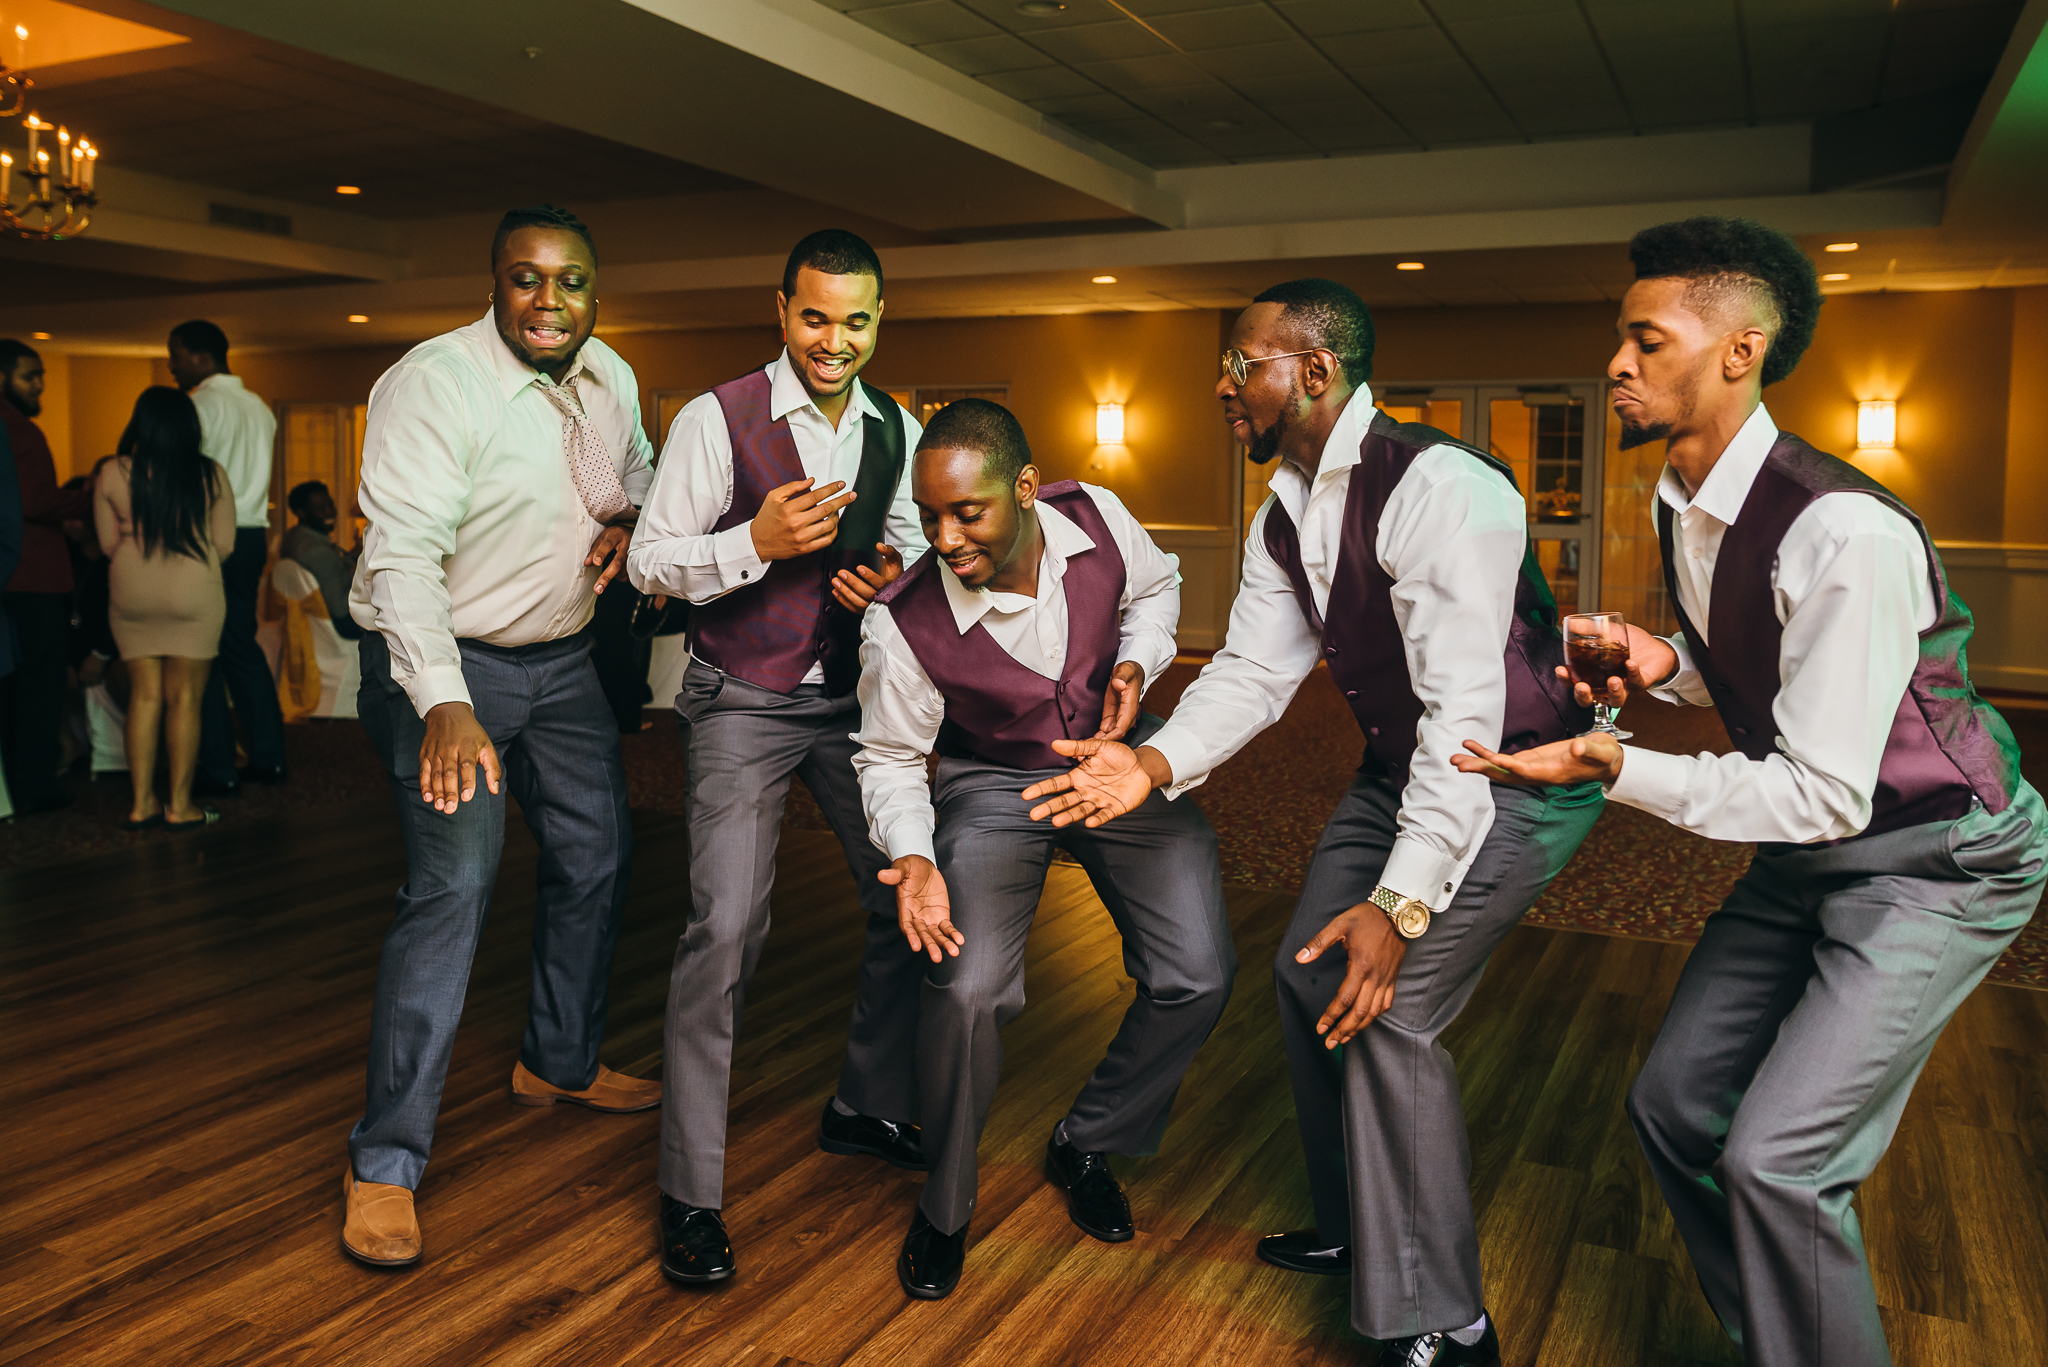 philadelphia-wedding-photographer-0079.jpg